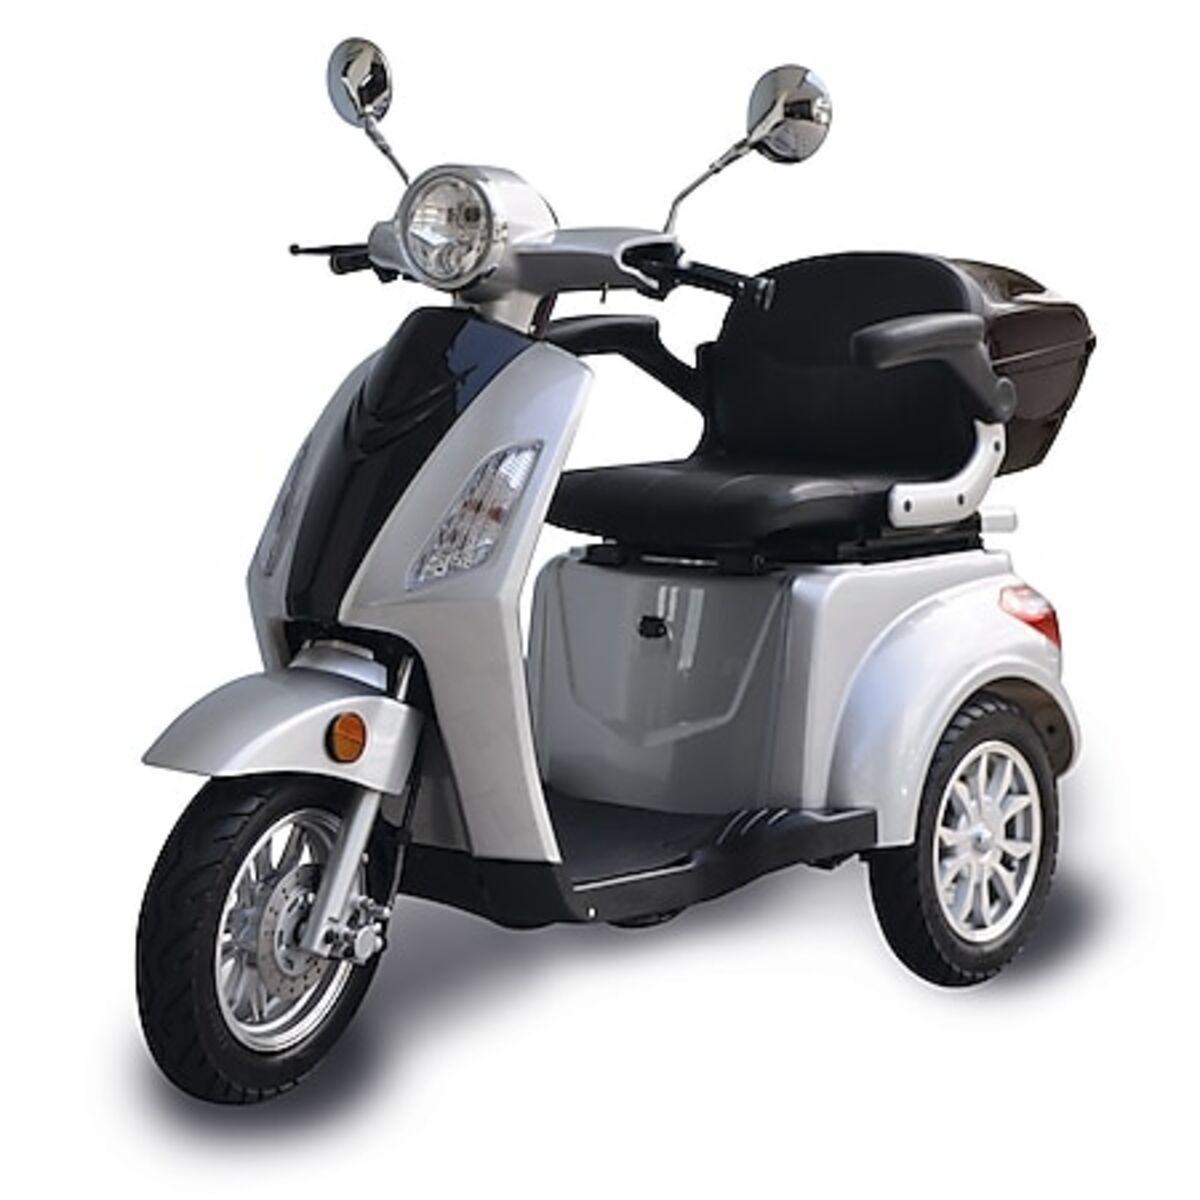 Bild 1 von Aktivimo 3-Rad E-Mobil Rimini